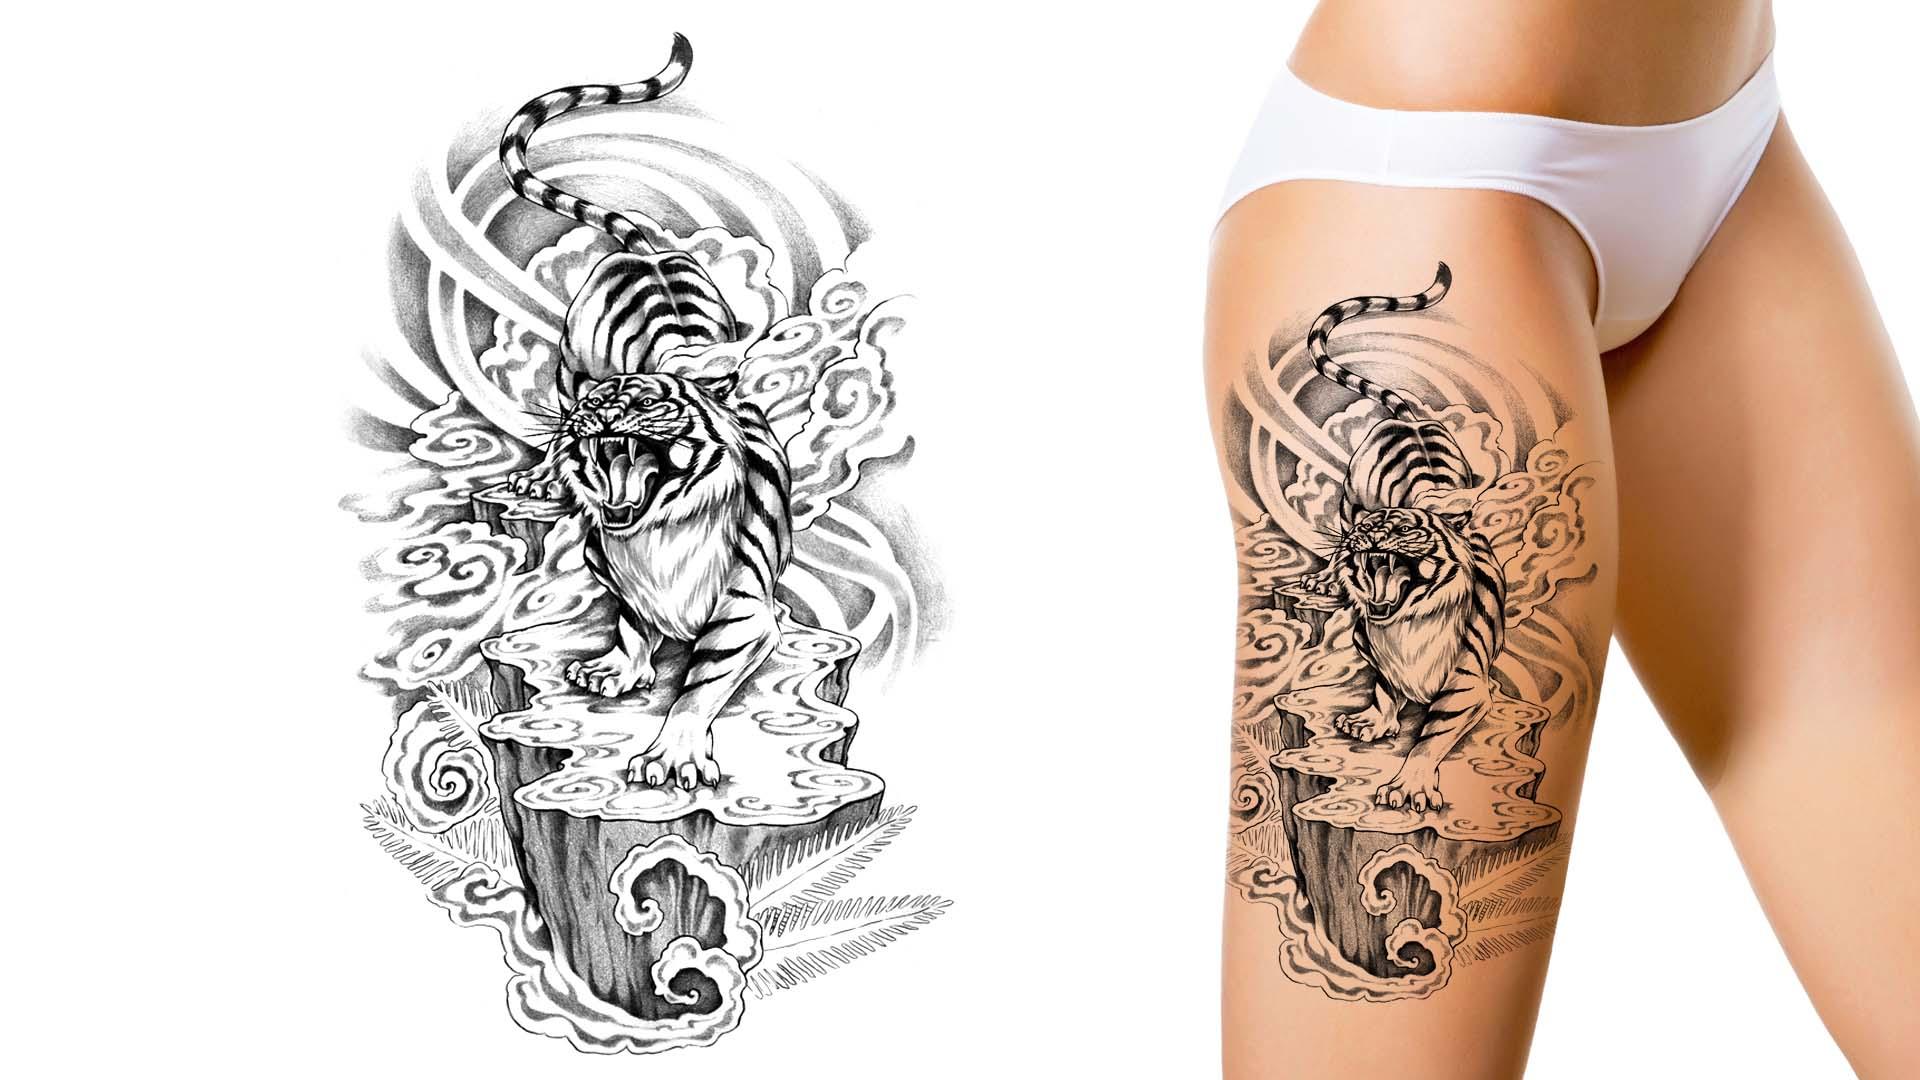 Tattoo design artwork video gallery custom tattoo design - Unique design gallery ...